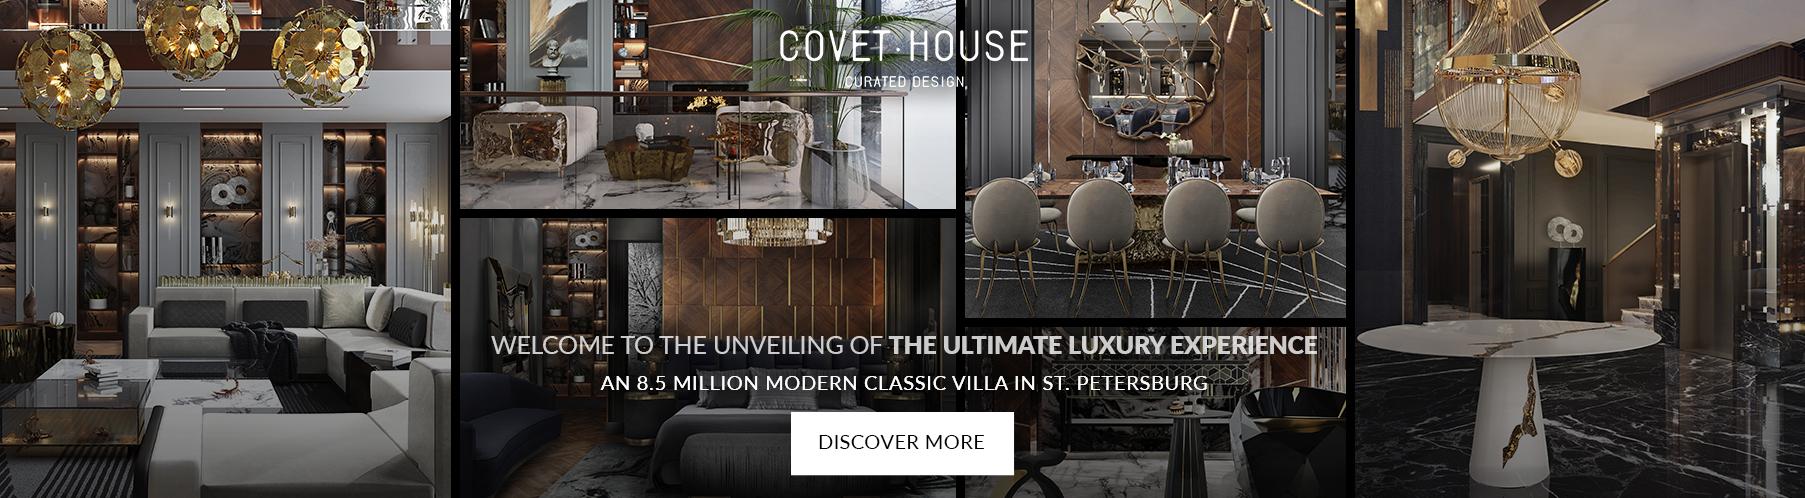 An 8.5 Million Modern Classic Villa by Covet House covet house An 8.5 Million Modern Classic Villa by Covet House blog artigo coveted4